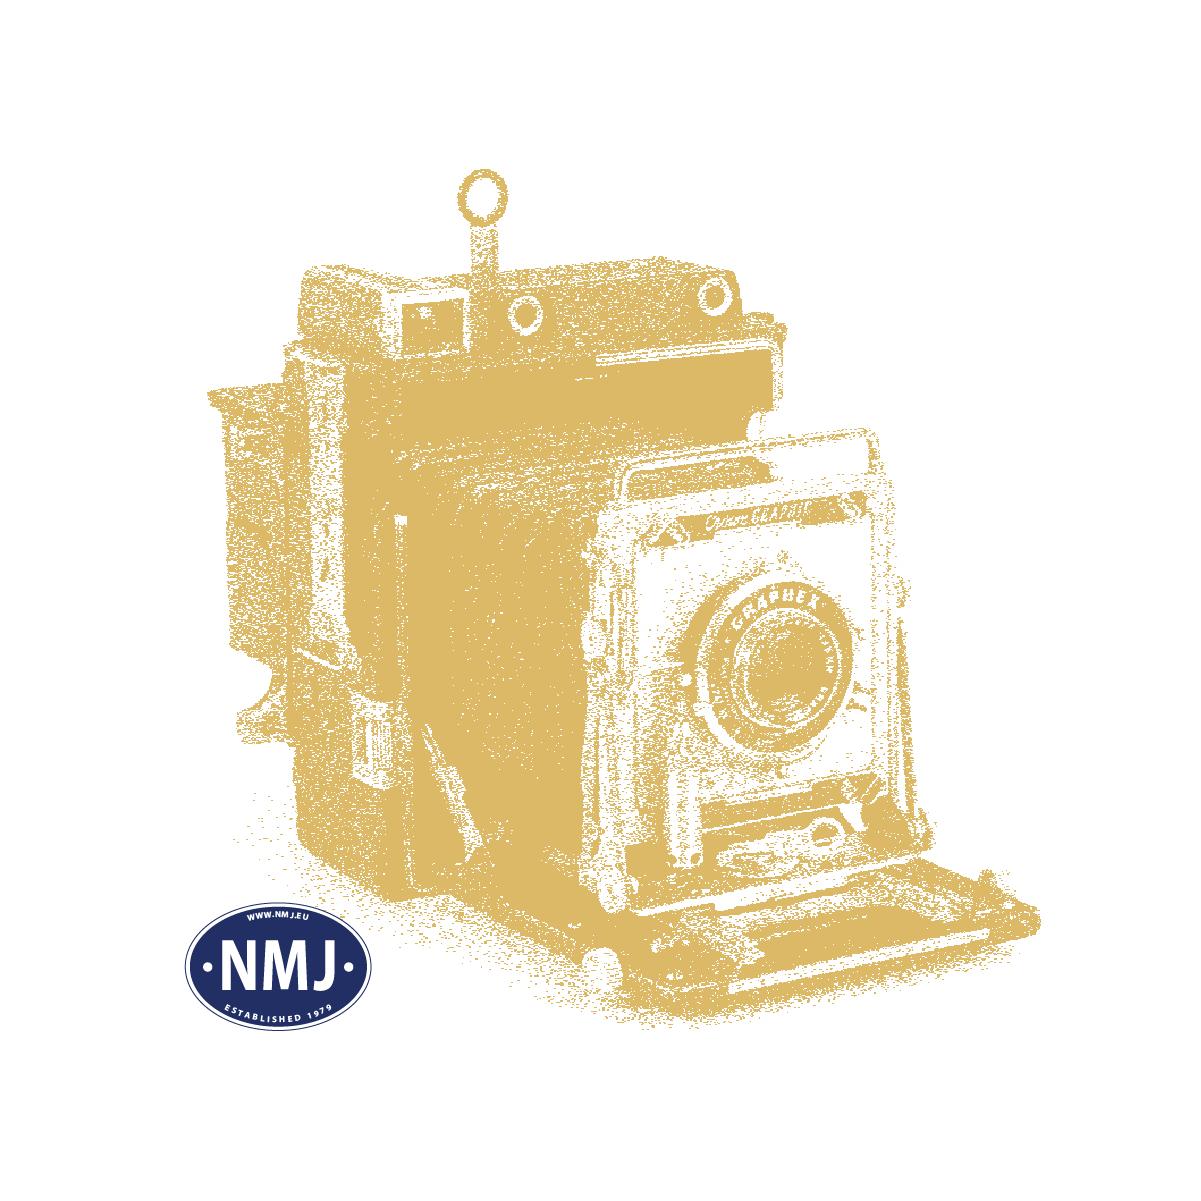 NMJST34238 - NMJ Superline NSB T3 4238 Stakevogn m/ Bremseplattform, *NMJ 40 ÅR*